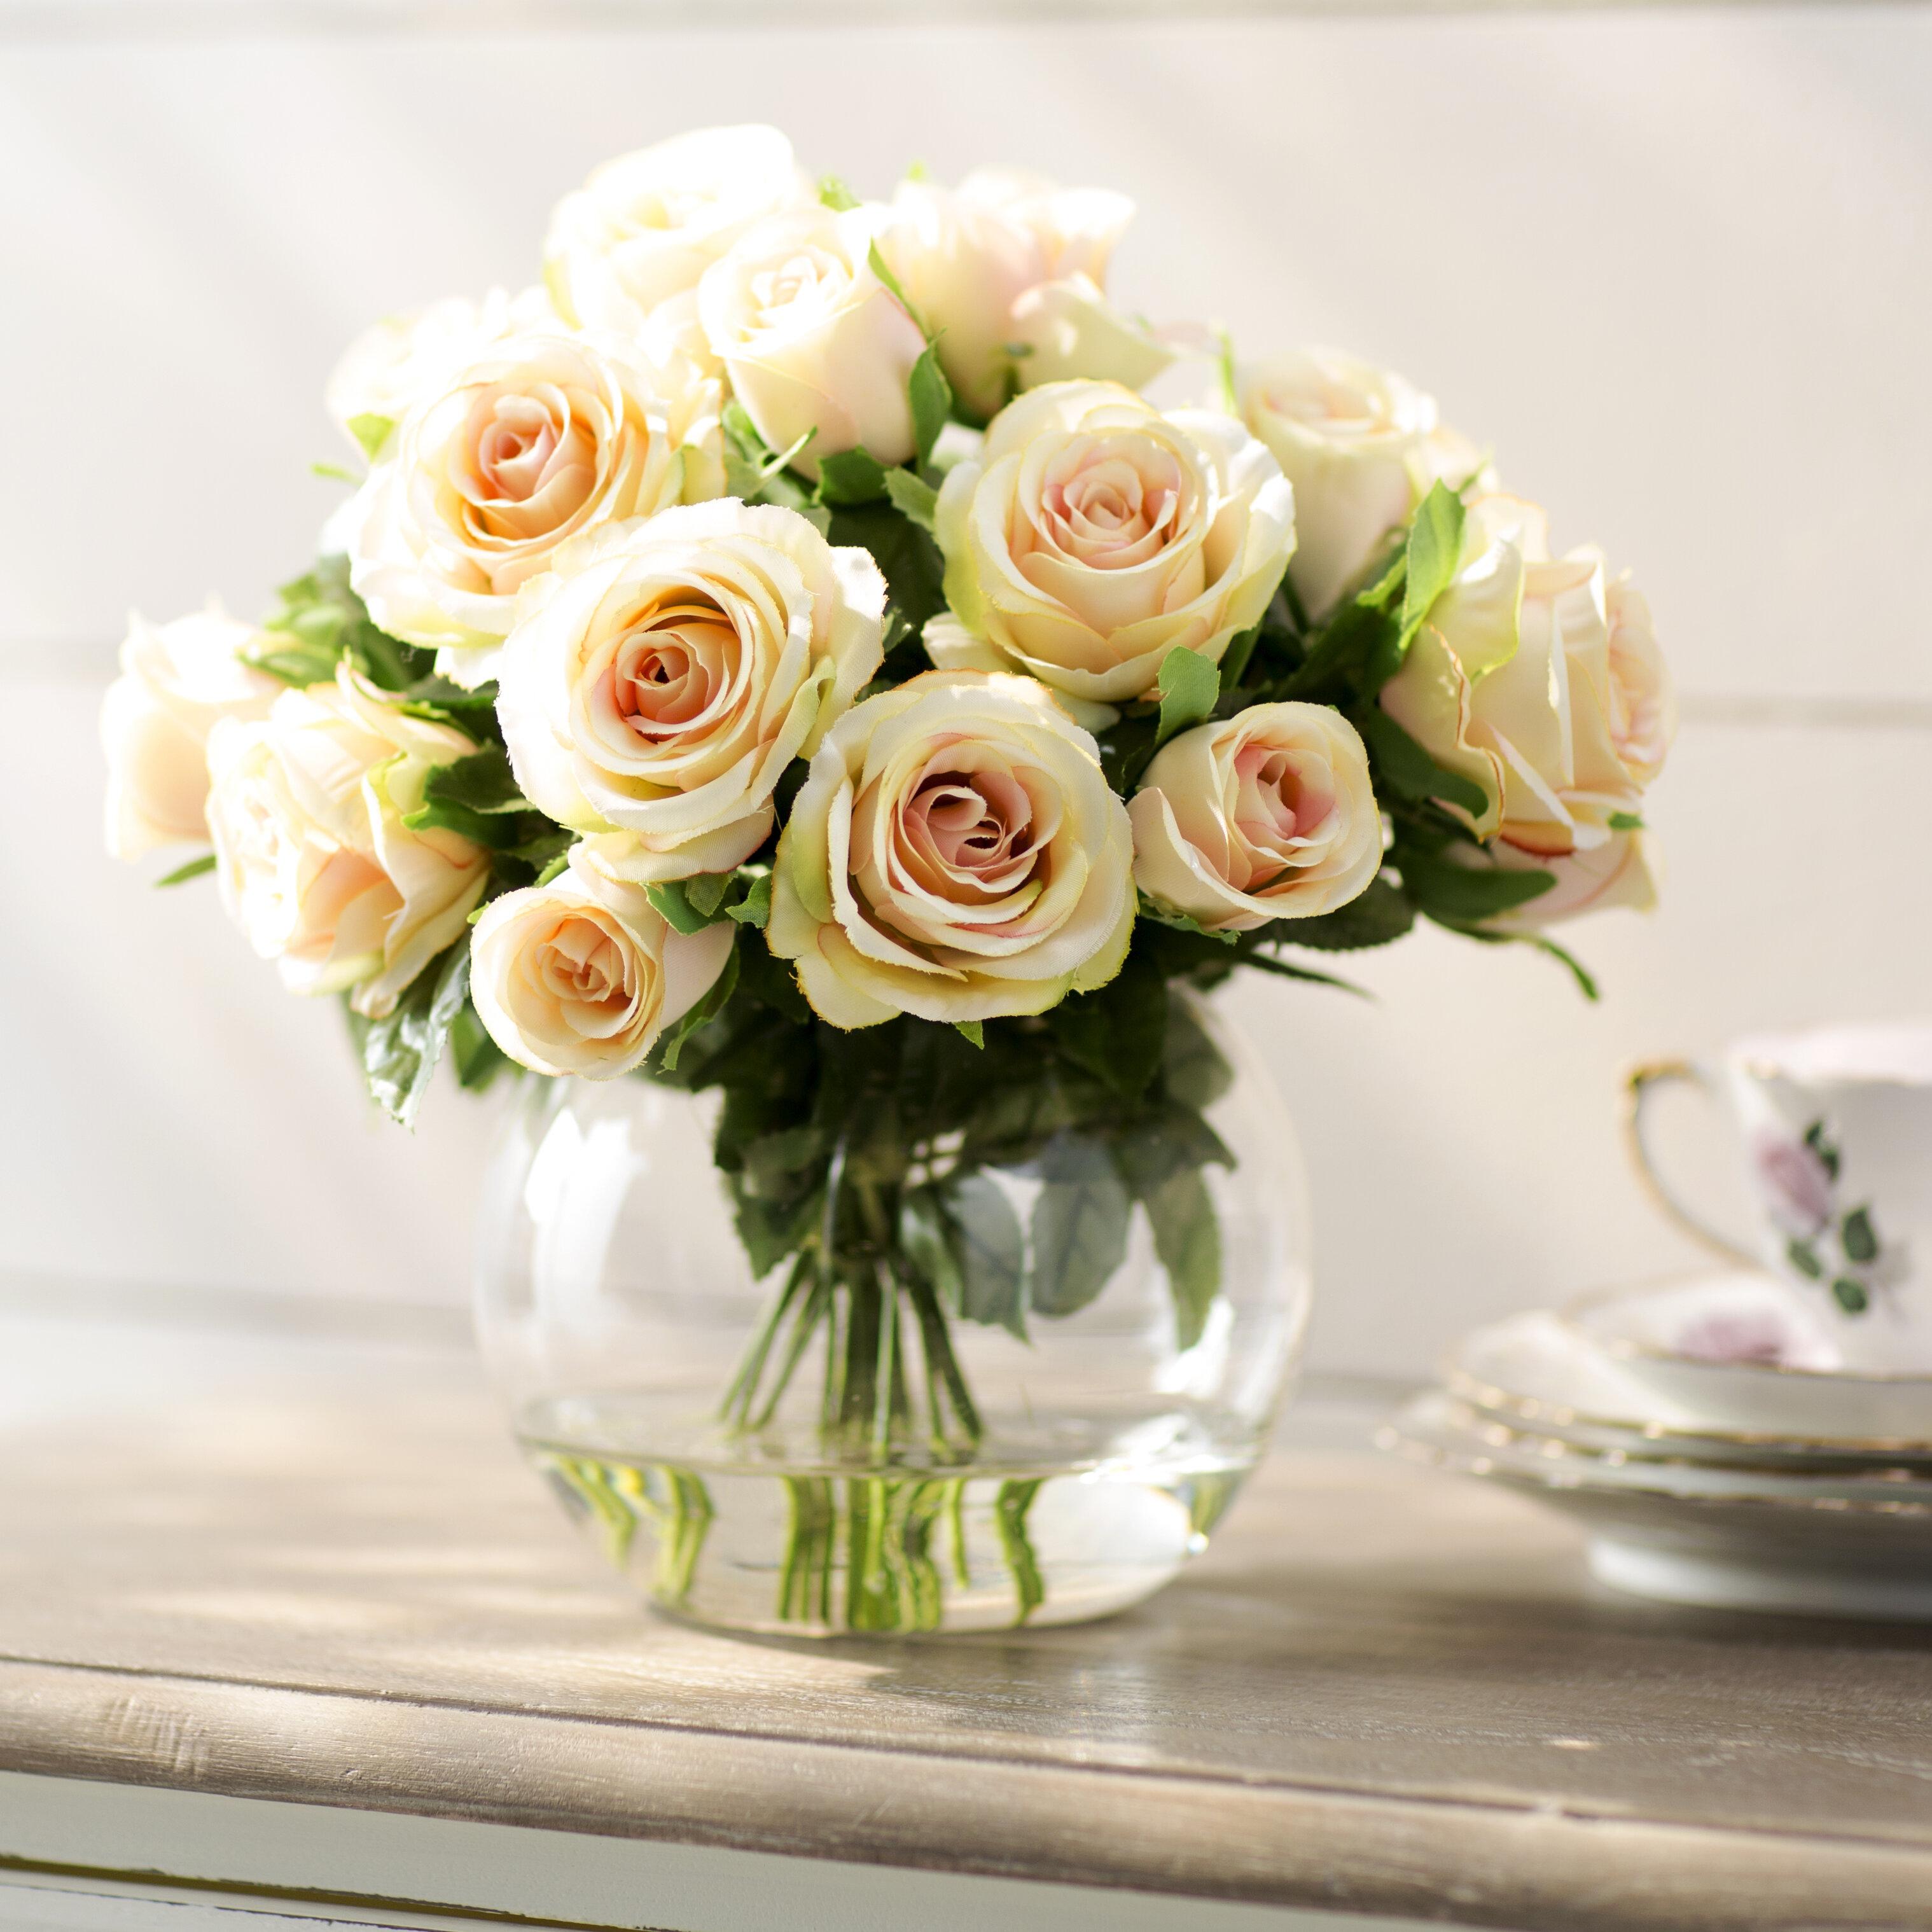 Lark Manor Sainte Rose Floral Arrangement In Glass Cup Vase Reviews Wayfair